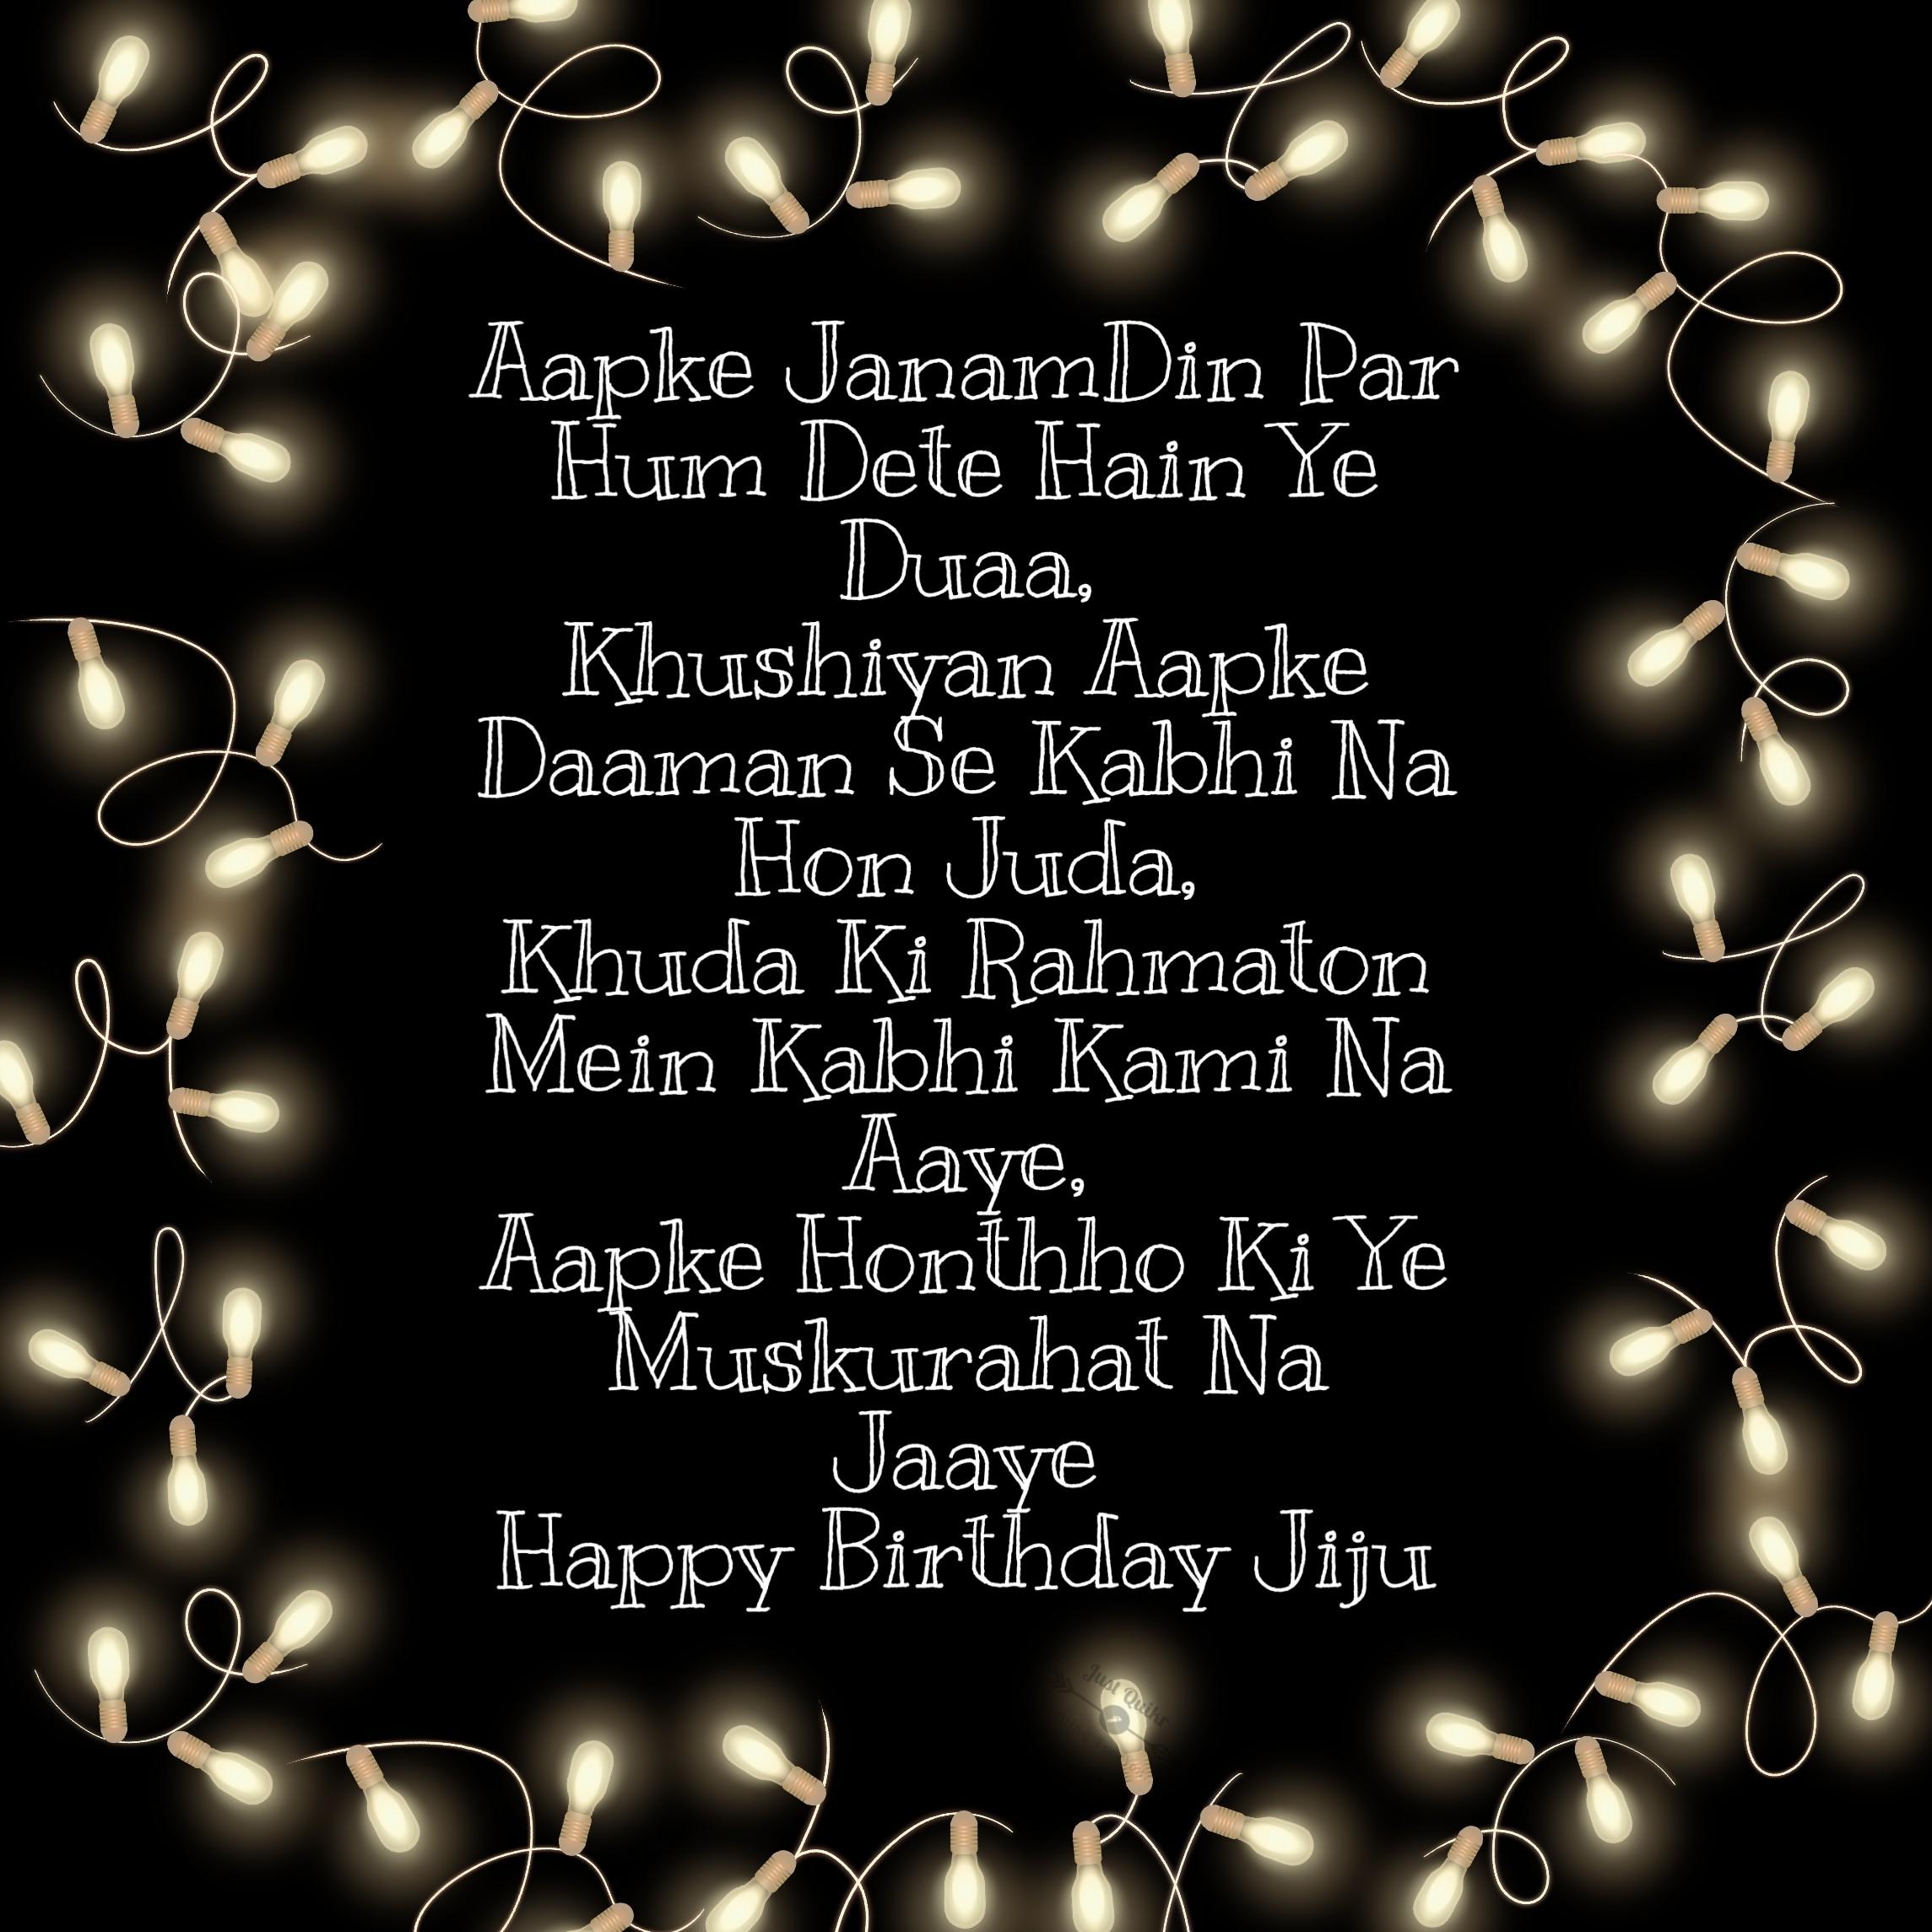 Happy Birthday Shayari Greetings Sayings SMS and Images for Jiju ji